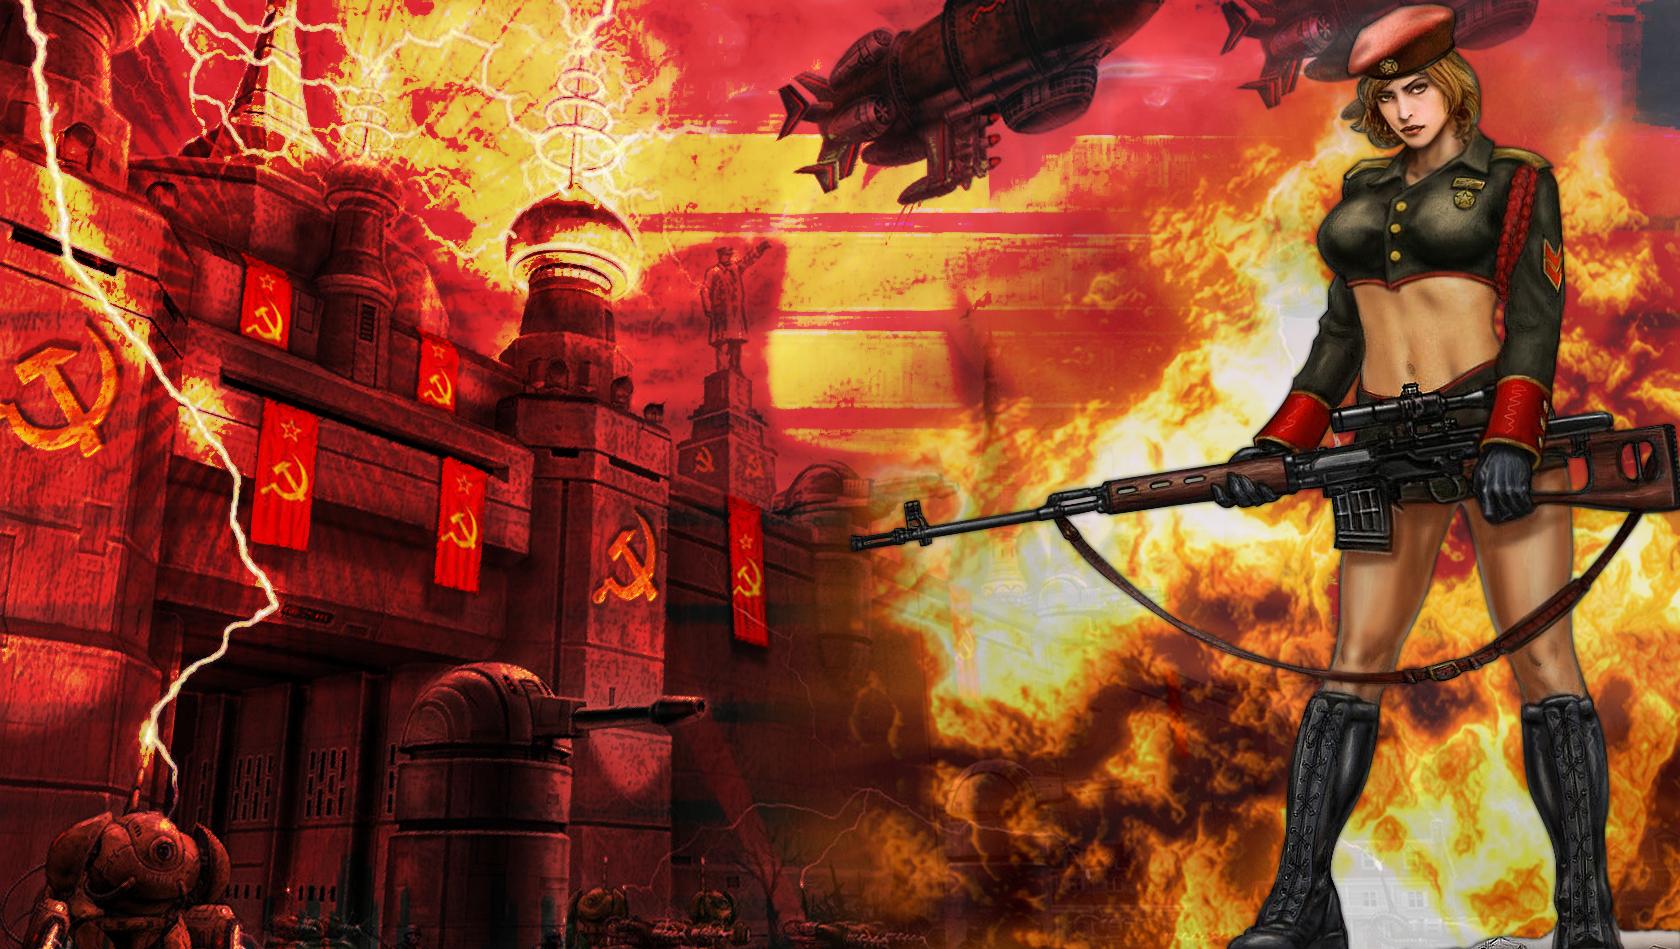 red_alert_3_wallpaper_by_sjmeets